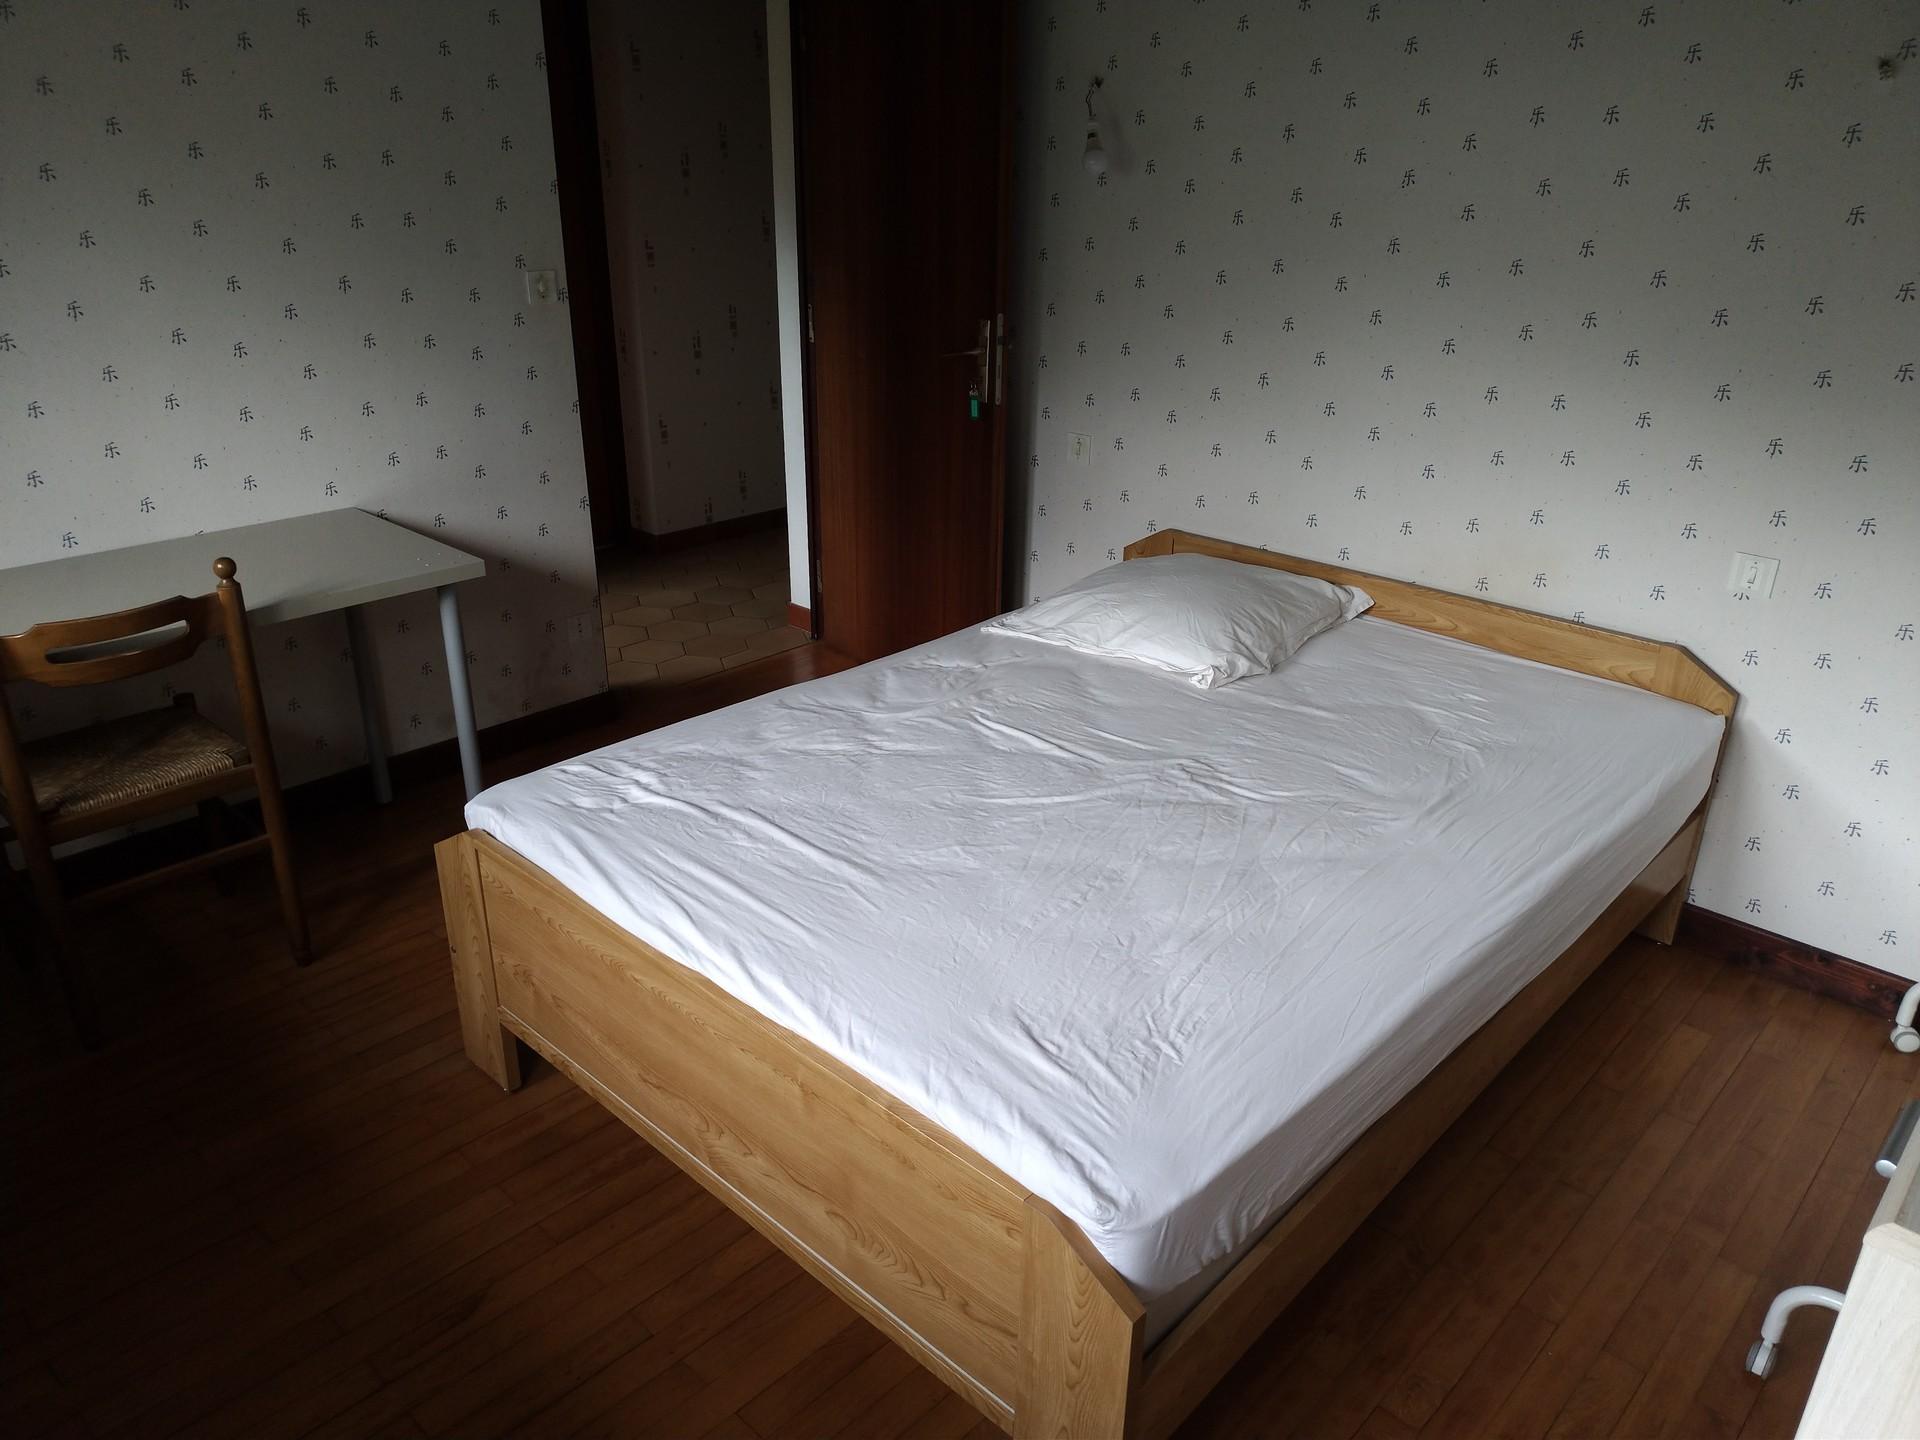 loue-chambre-etudiant-meuble-villa-t4-frange-verte-077fa5ff6aeb377944ca981ec709c773